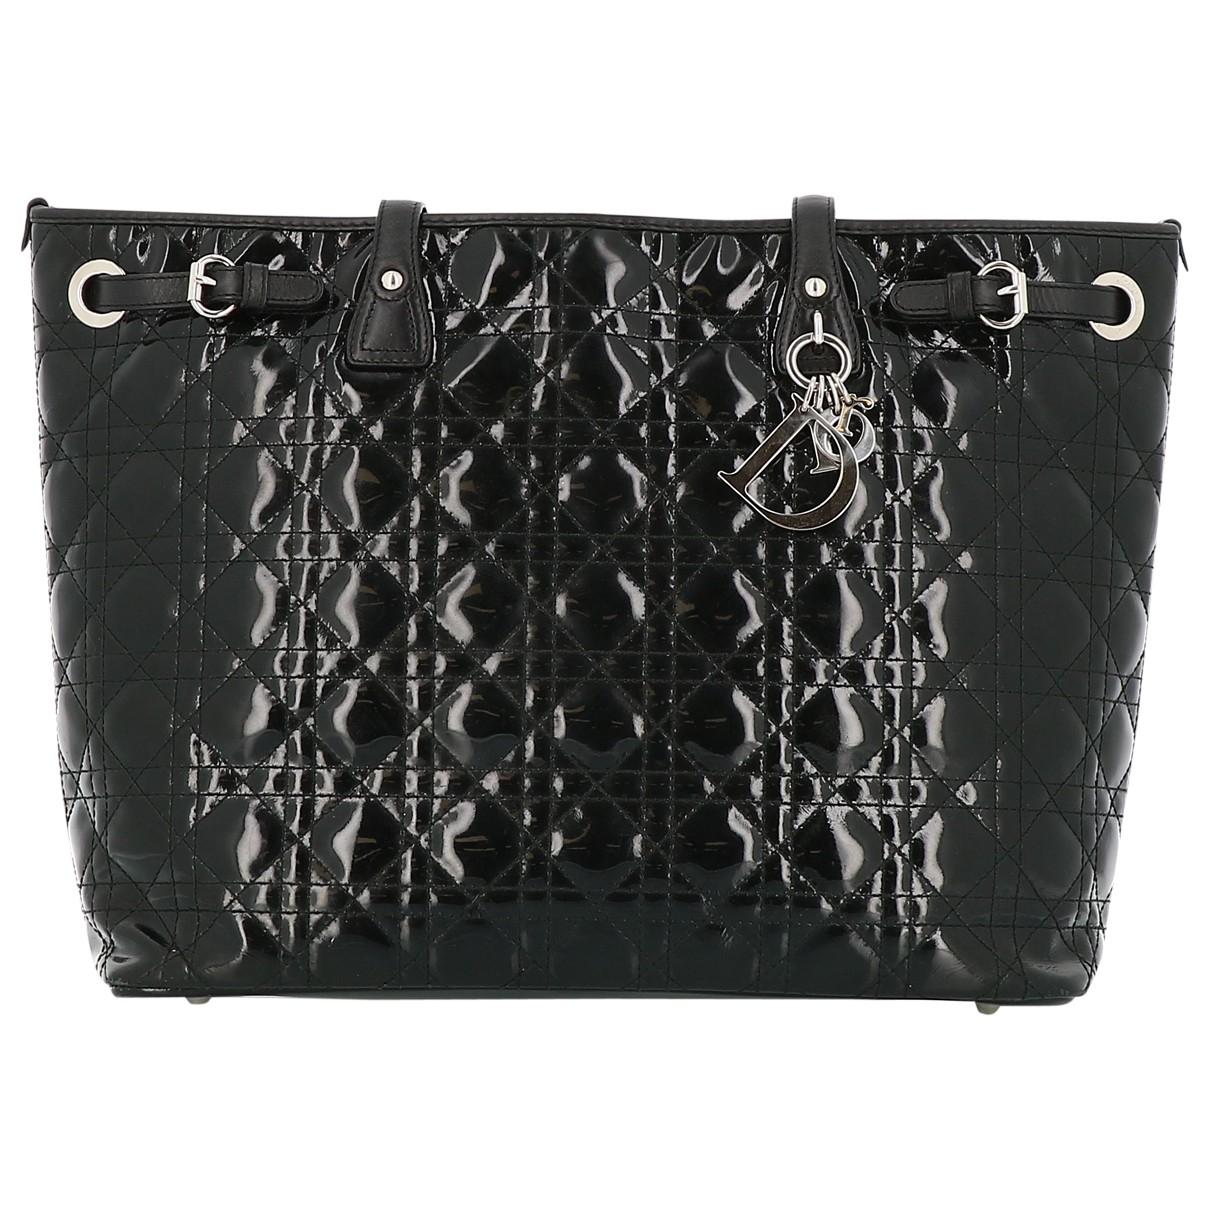 Dior Dior Panarea Black Patent leather handbag for Women \N